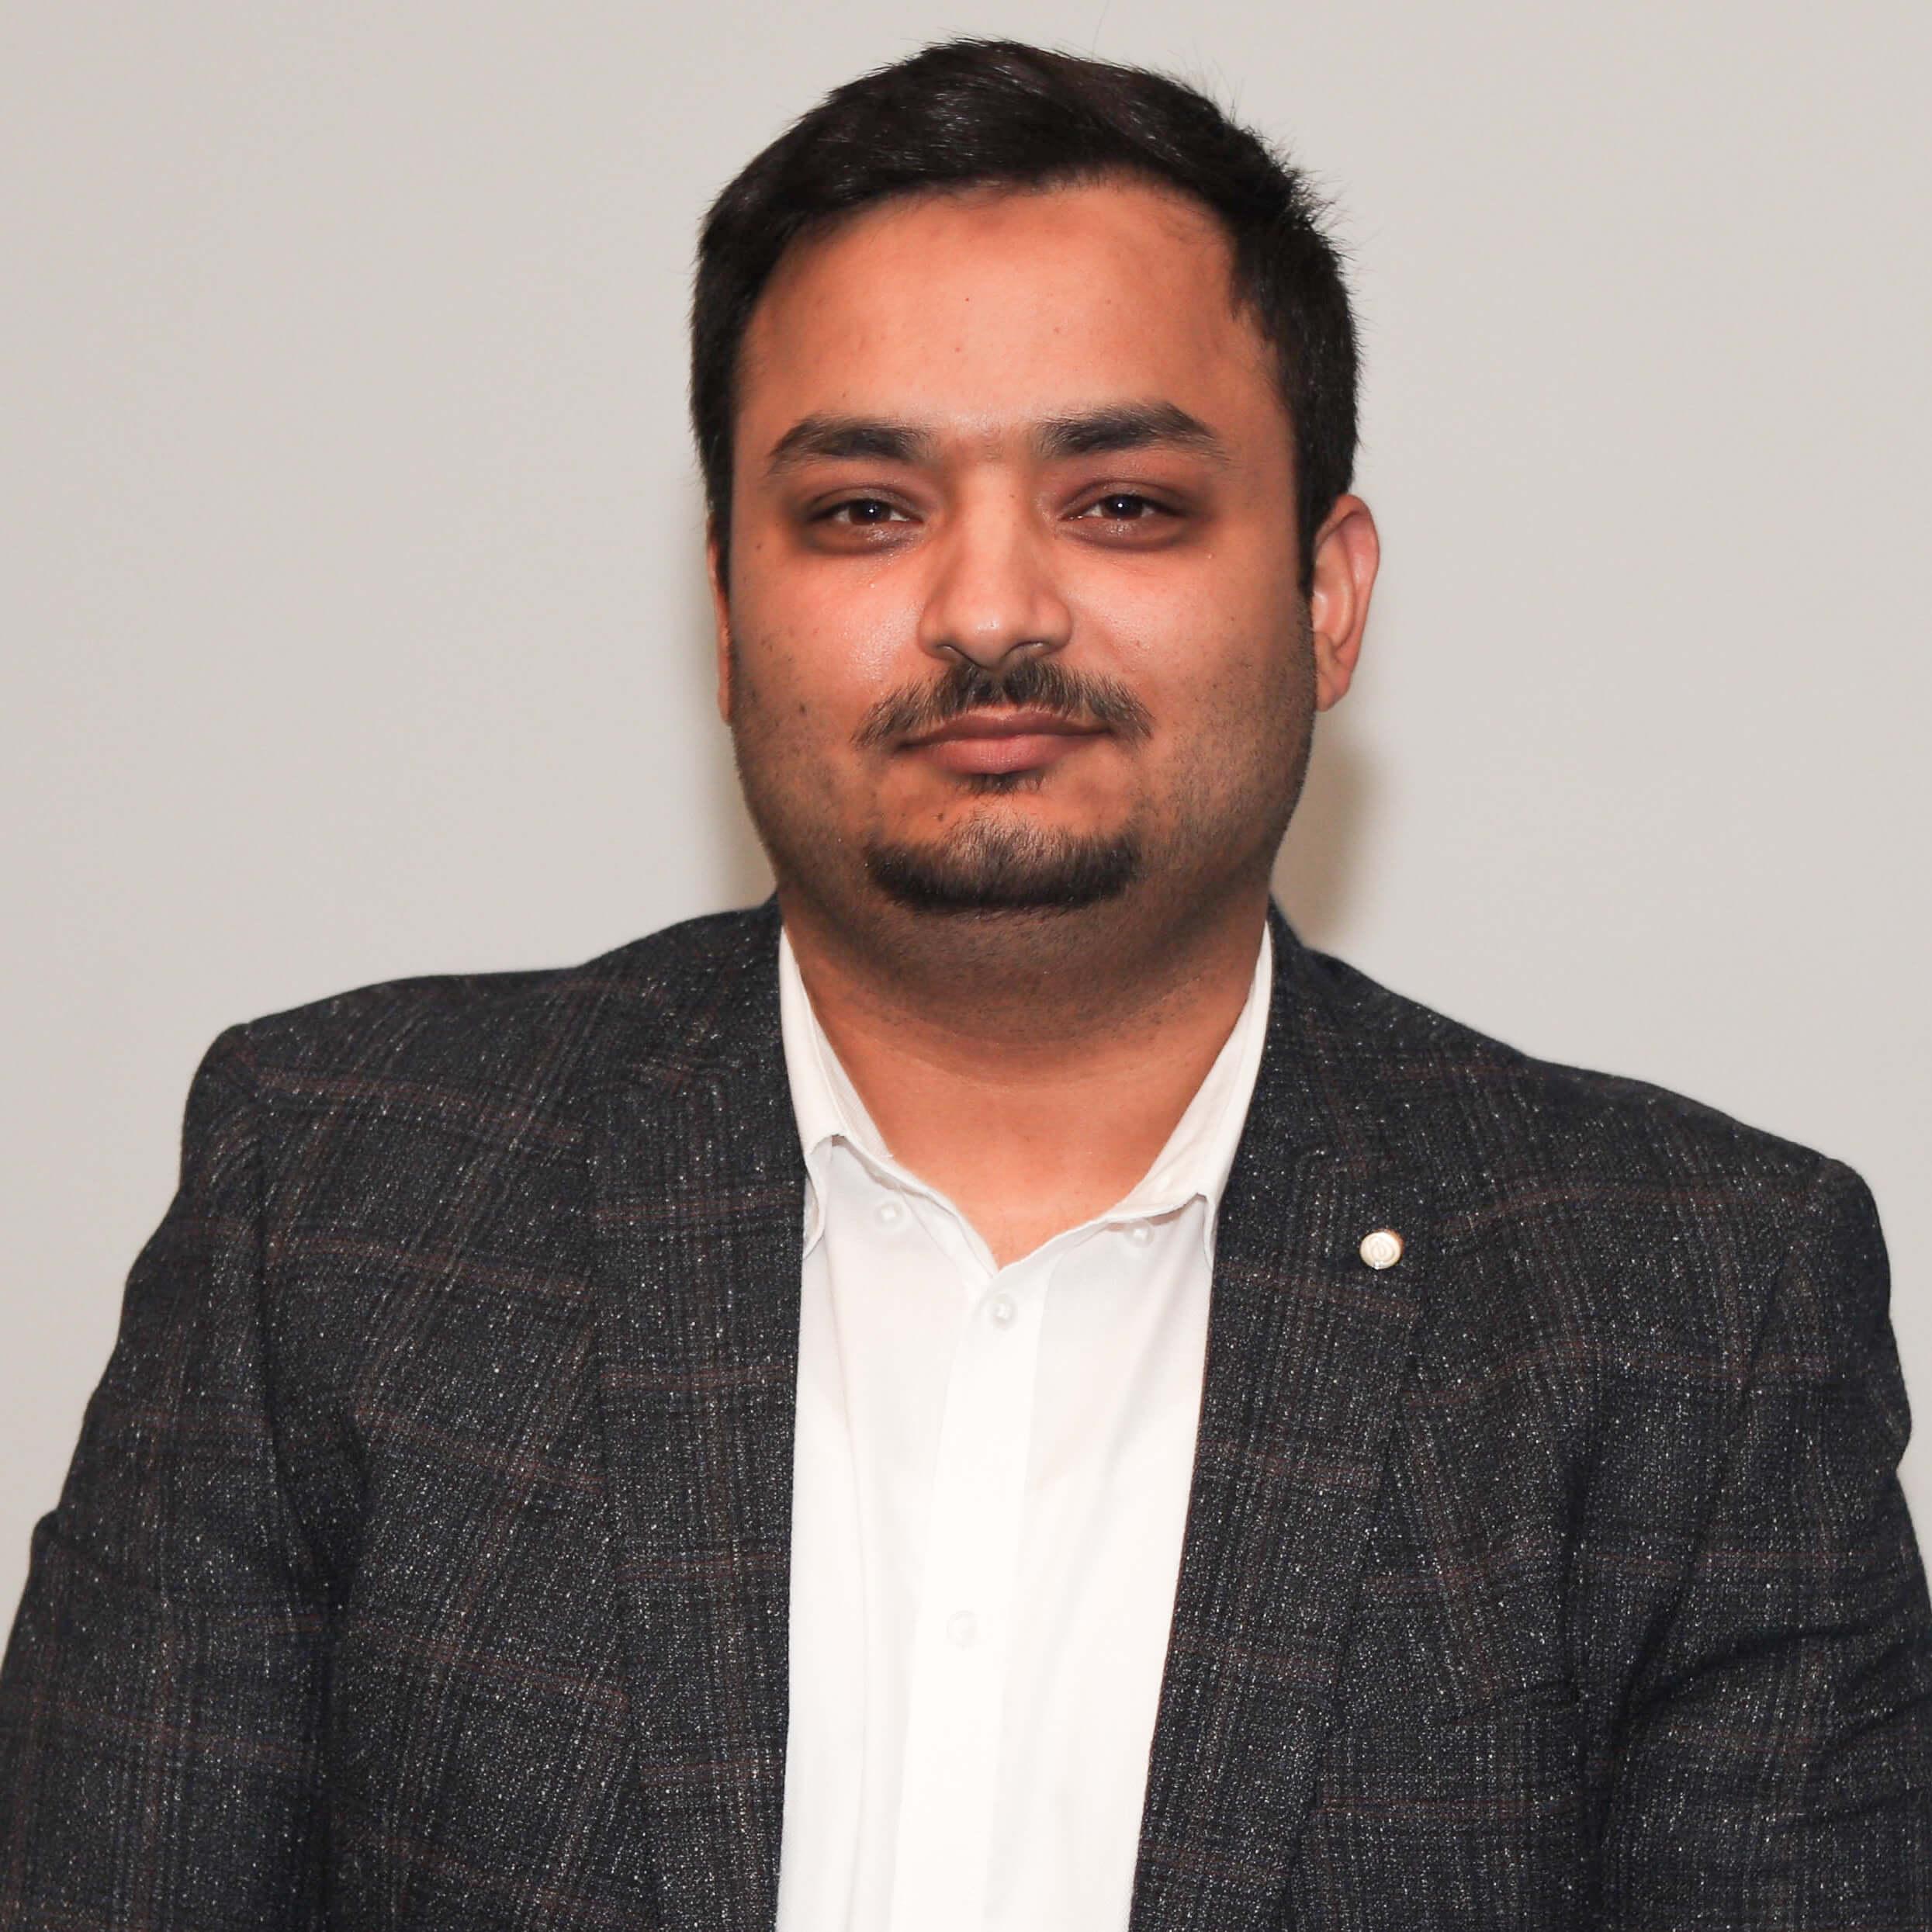 Mubeen Ahmad - AGM 2019